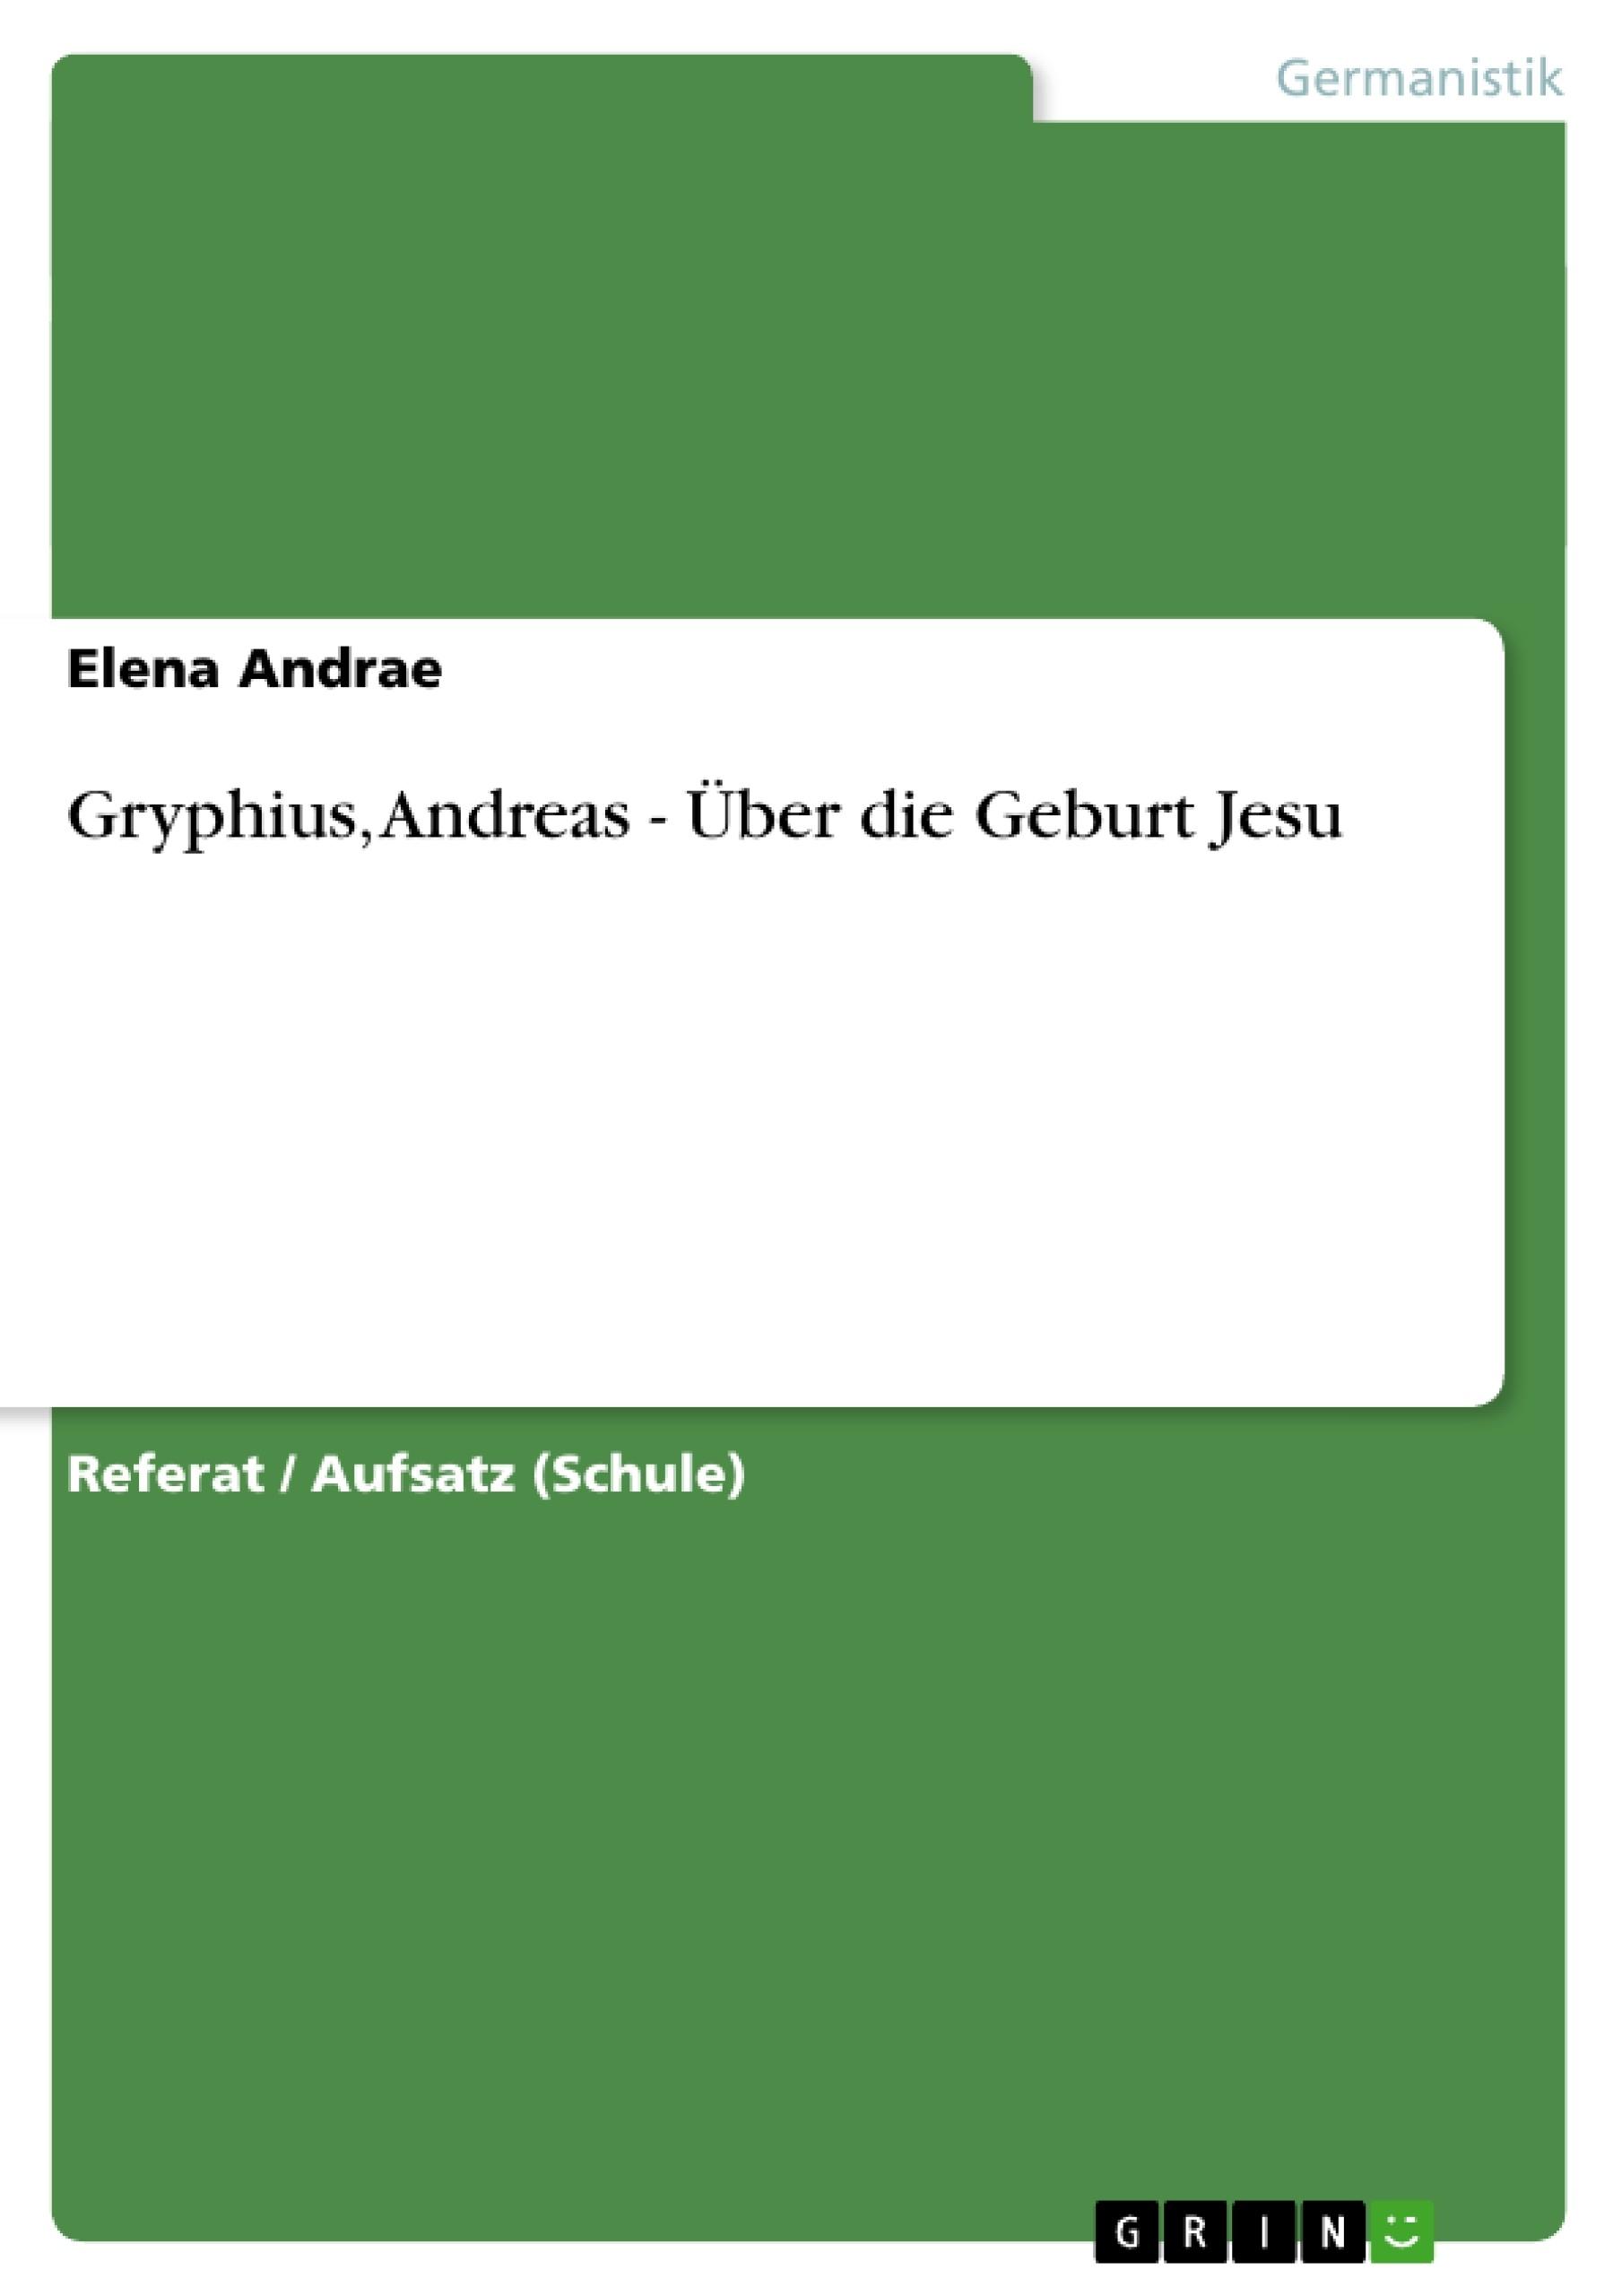 Titel: Gryphius, Andreas - Über die Geburt Jesu